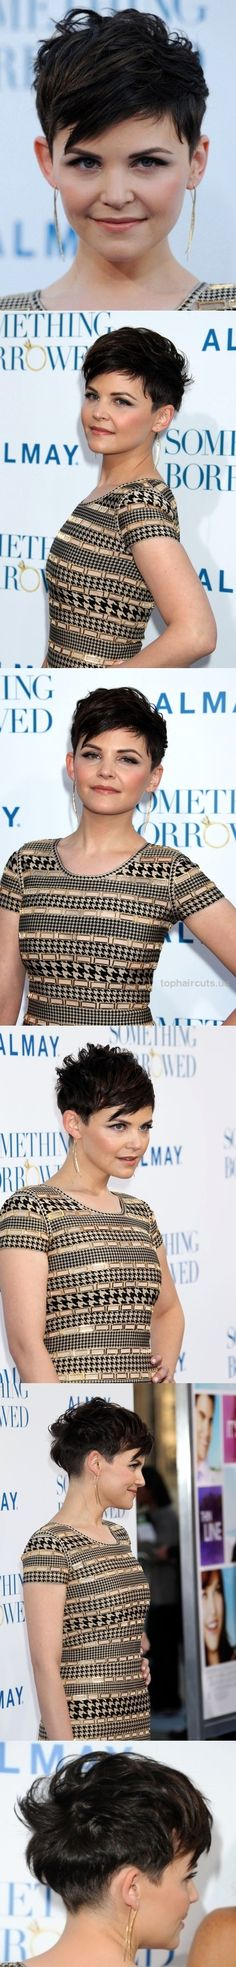 All views of Ginnifer Goodwin haircut…  All views of Ginnifer Goodwin haircut  http://www.tophaircuts.us/2017/06/17/all-views-of-ginnifer-goodwin-haircut/